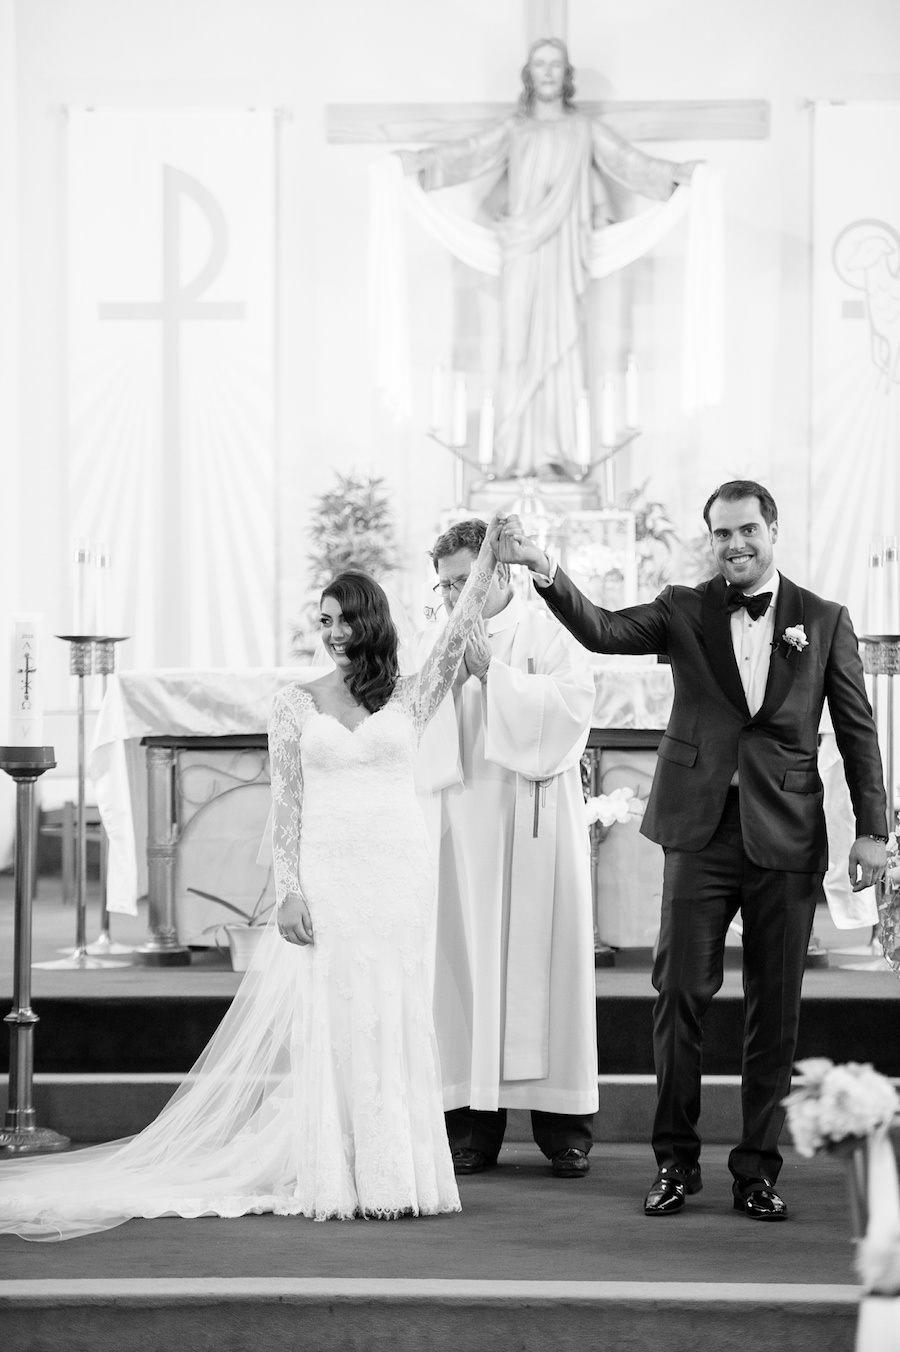 Bride and Groom Say I Do At Tampa Wedding Ceremony | Tampa Wedding Photographer Andi Diamond Photography